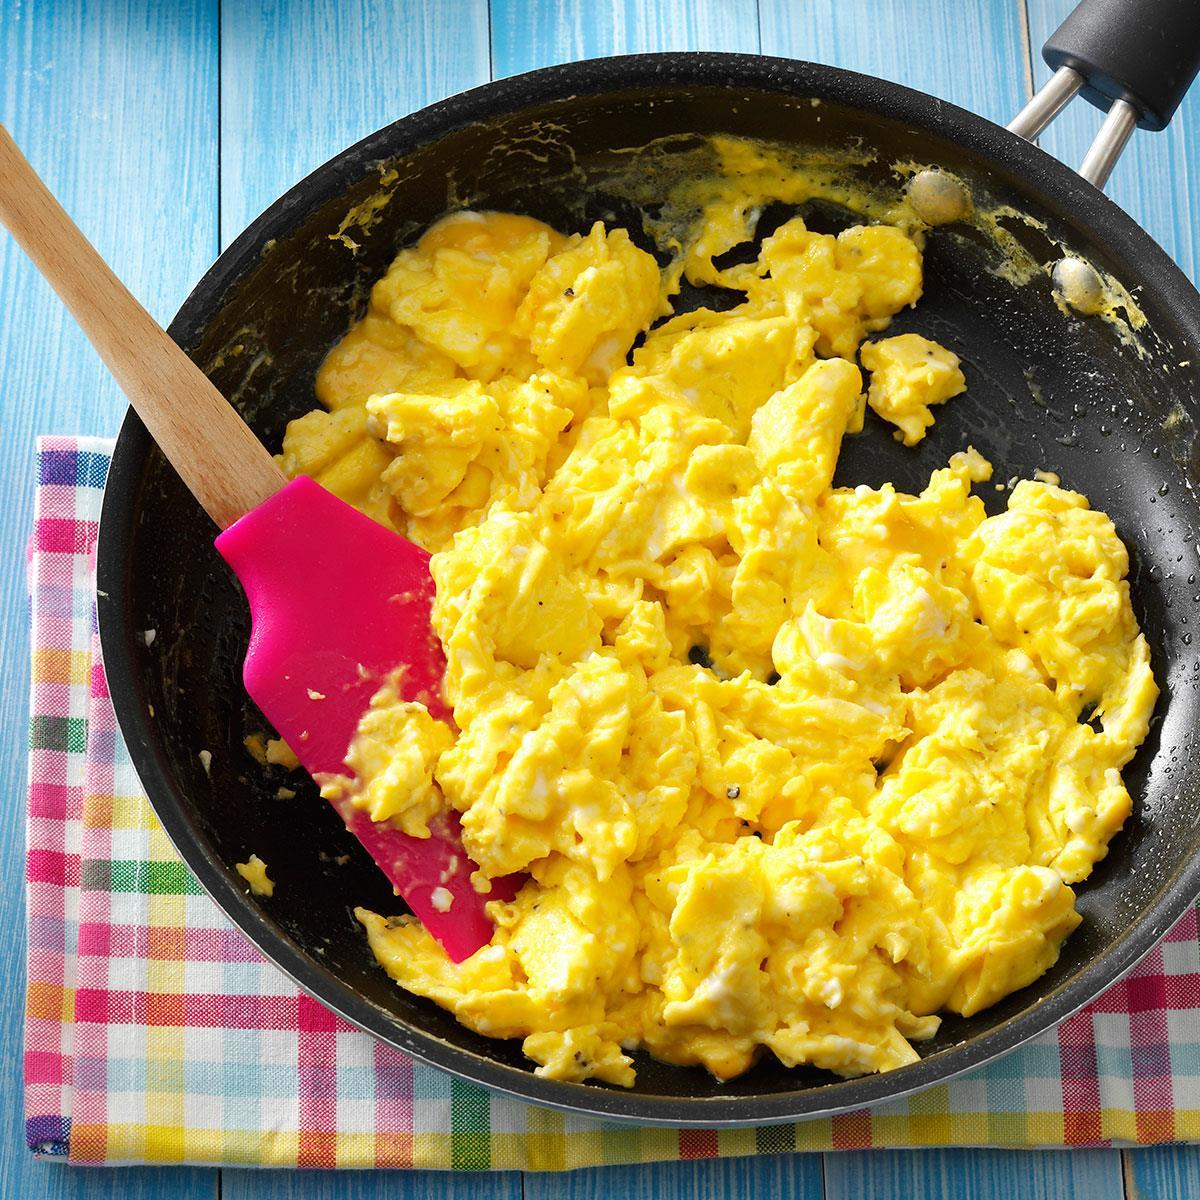 Star Spangled Breakfast